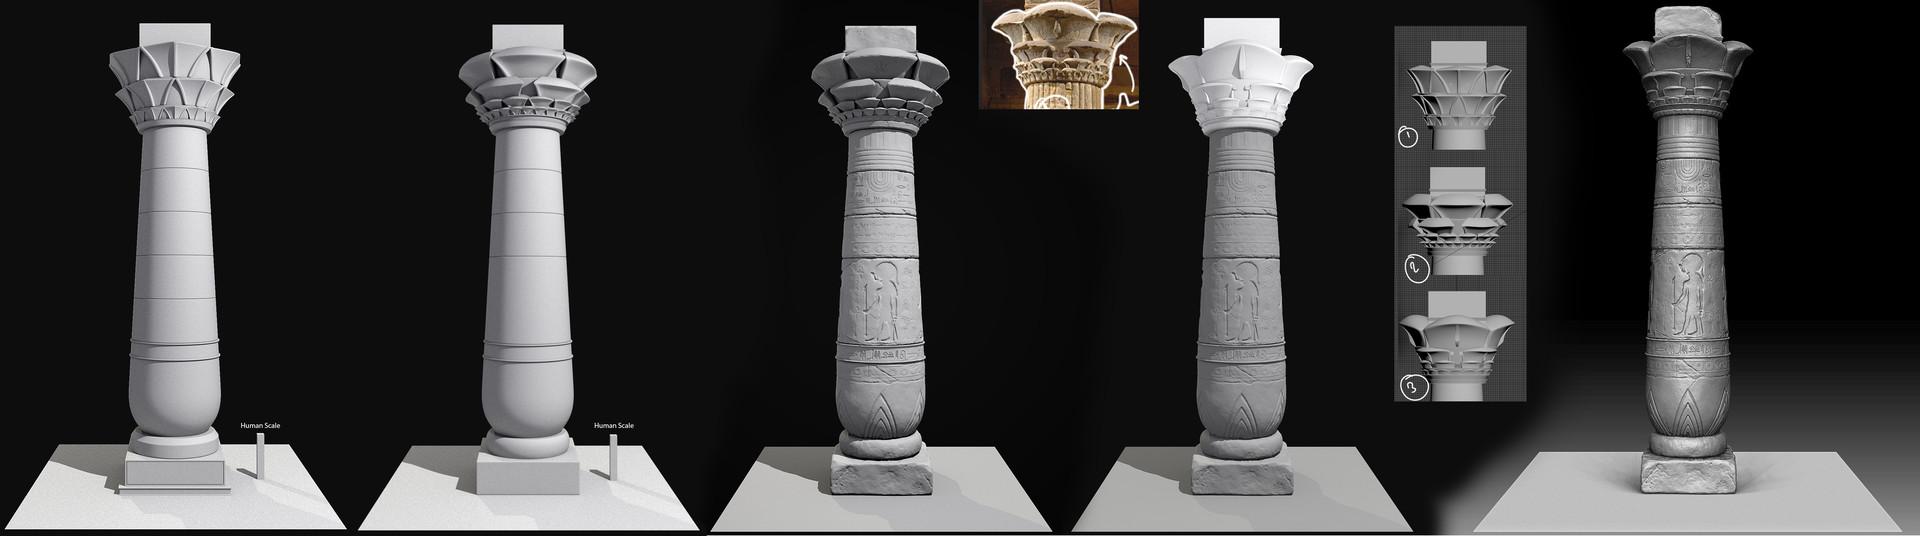 Pablo artime egyptian pillar process